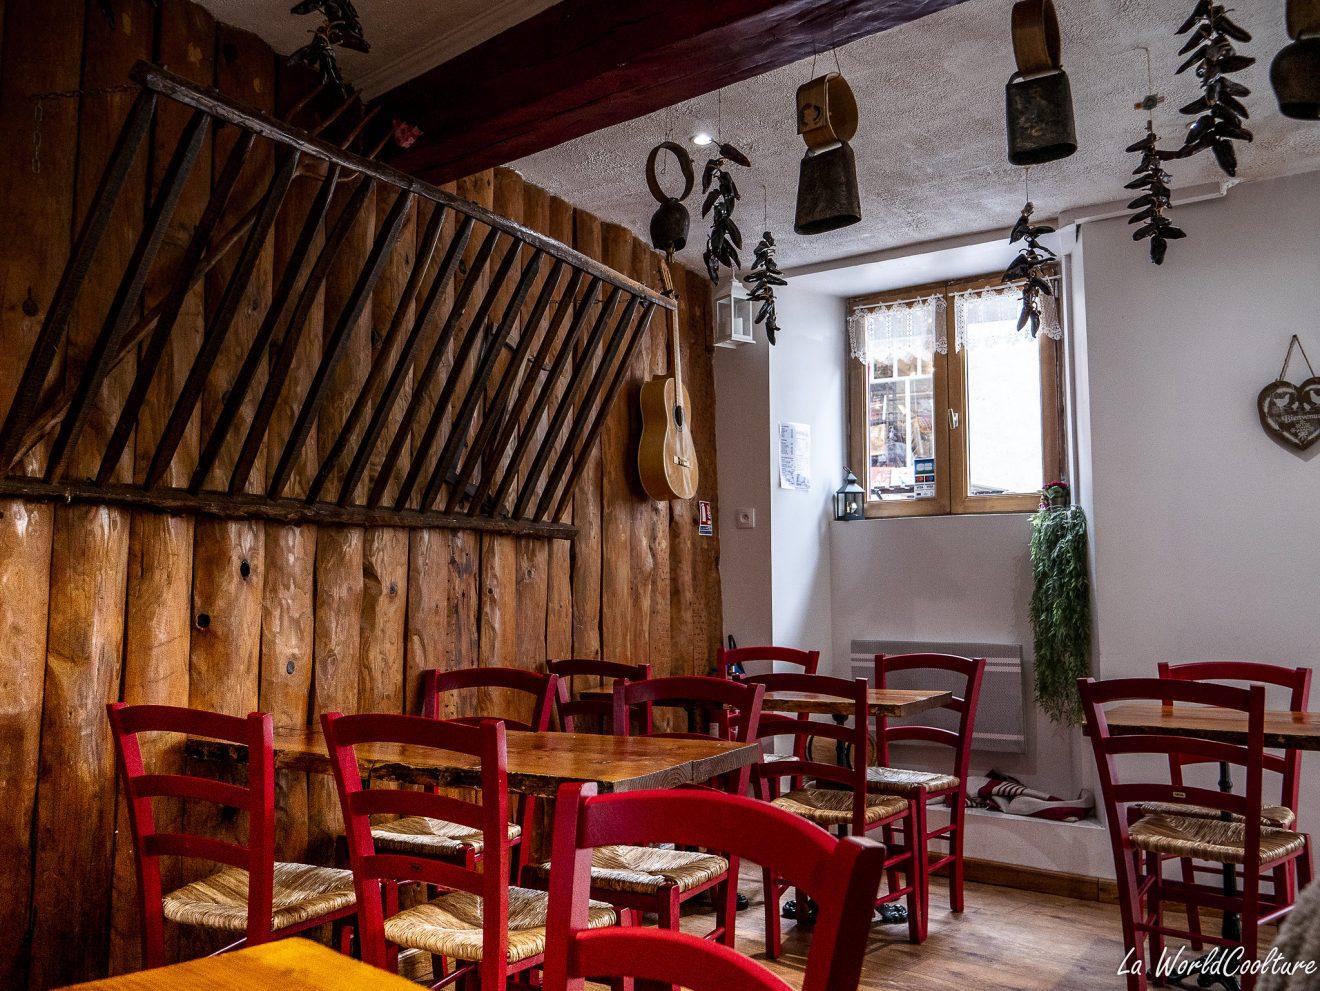 Bon restaurant Saint-Bertrand-de-Comminges